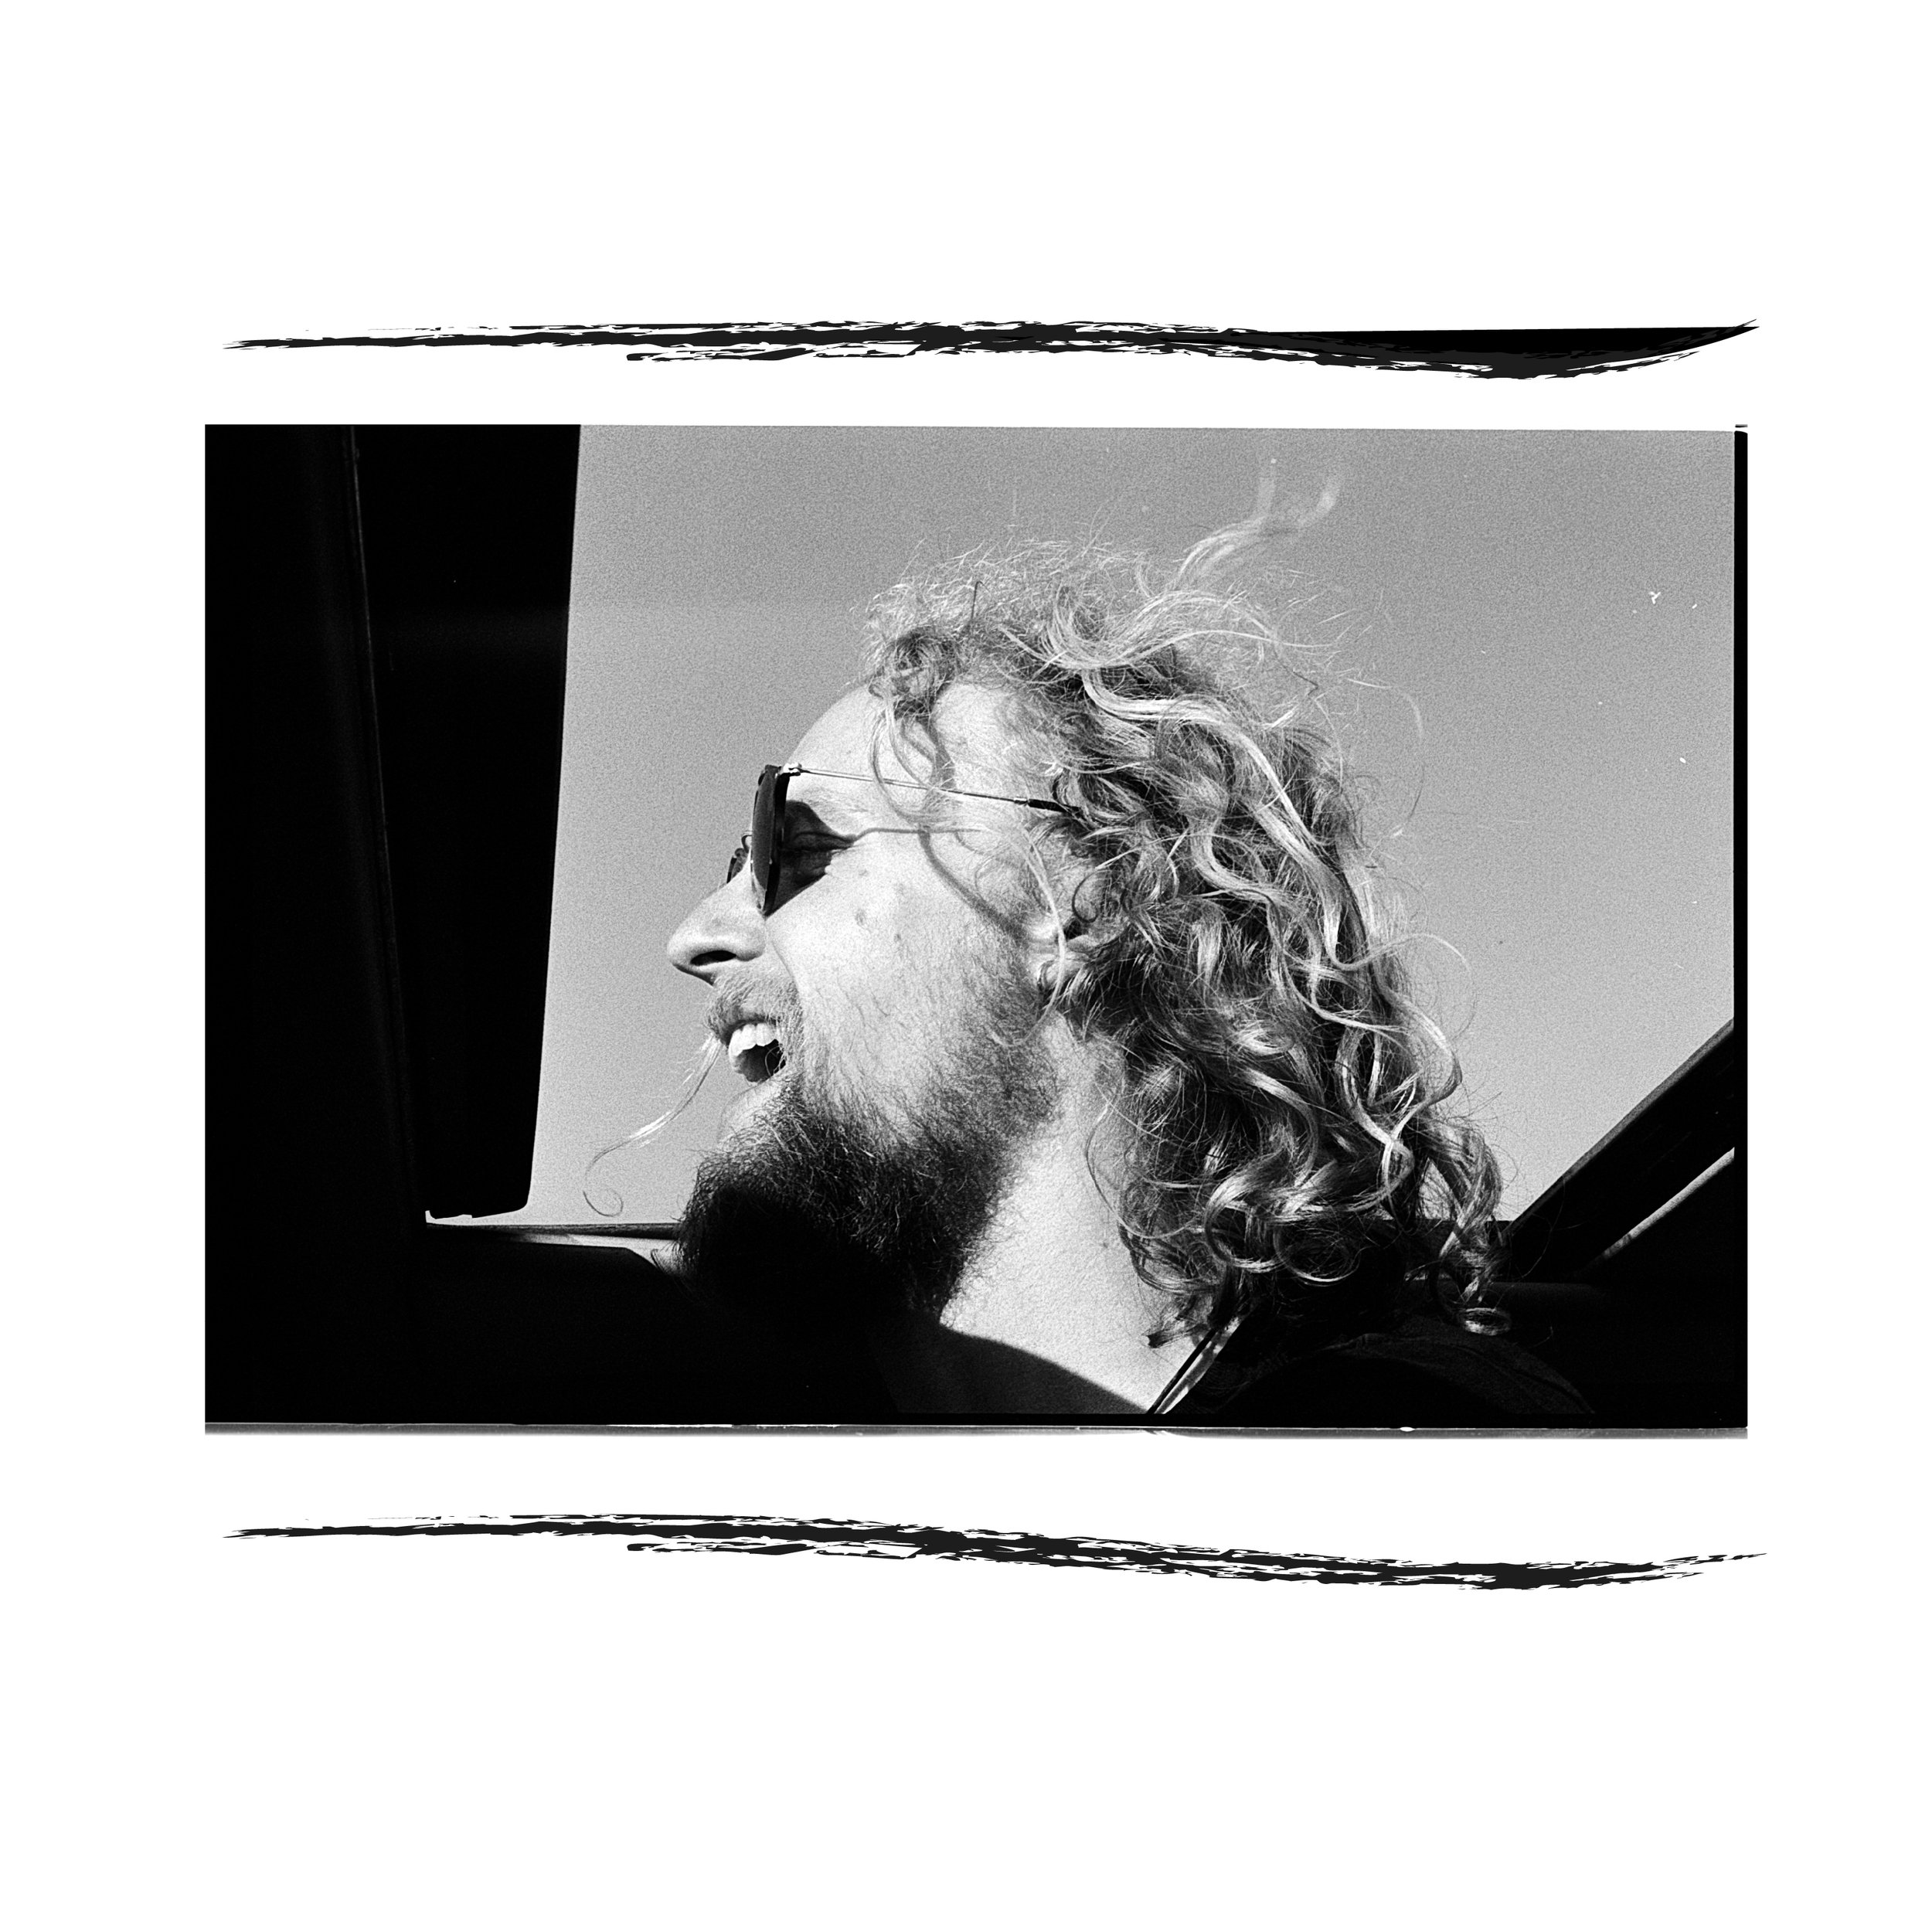 Samana, Samana Music, Franklin Mockett, Black and white photography,